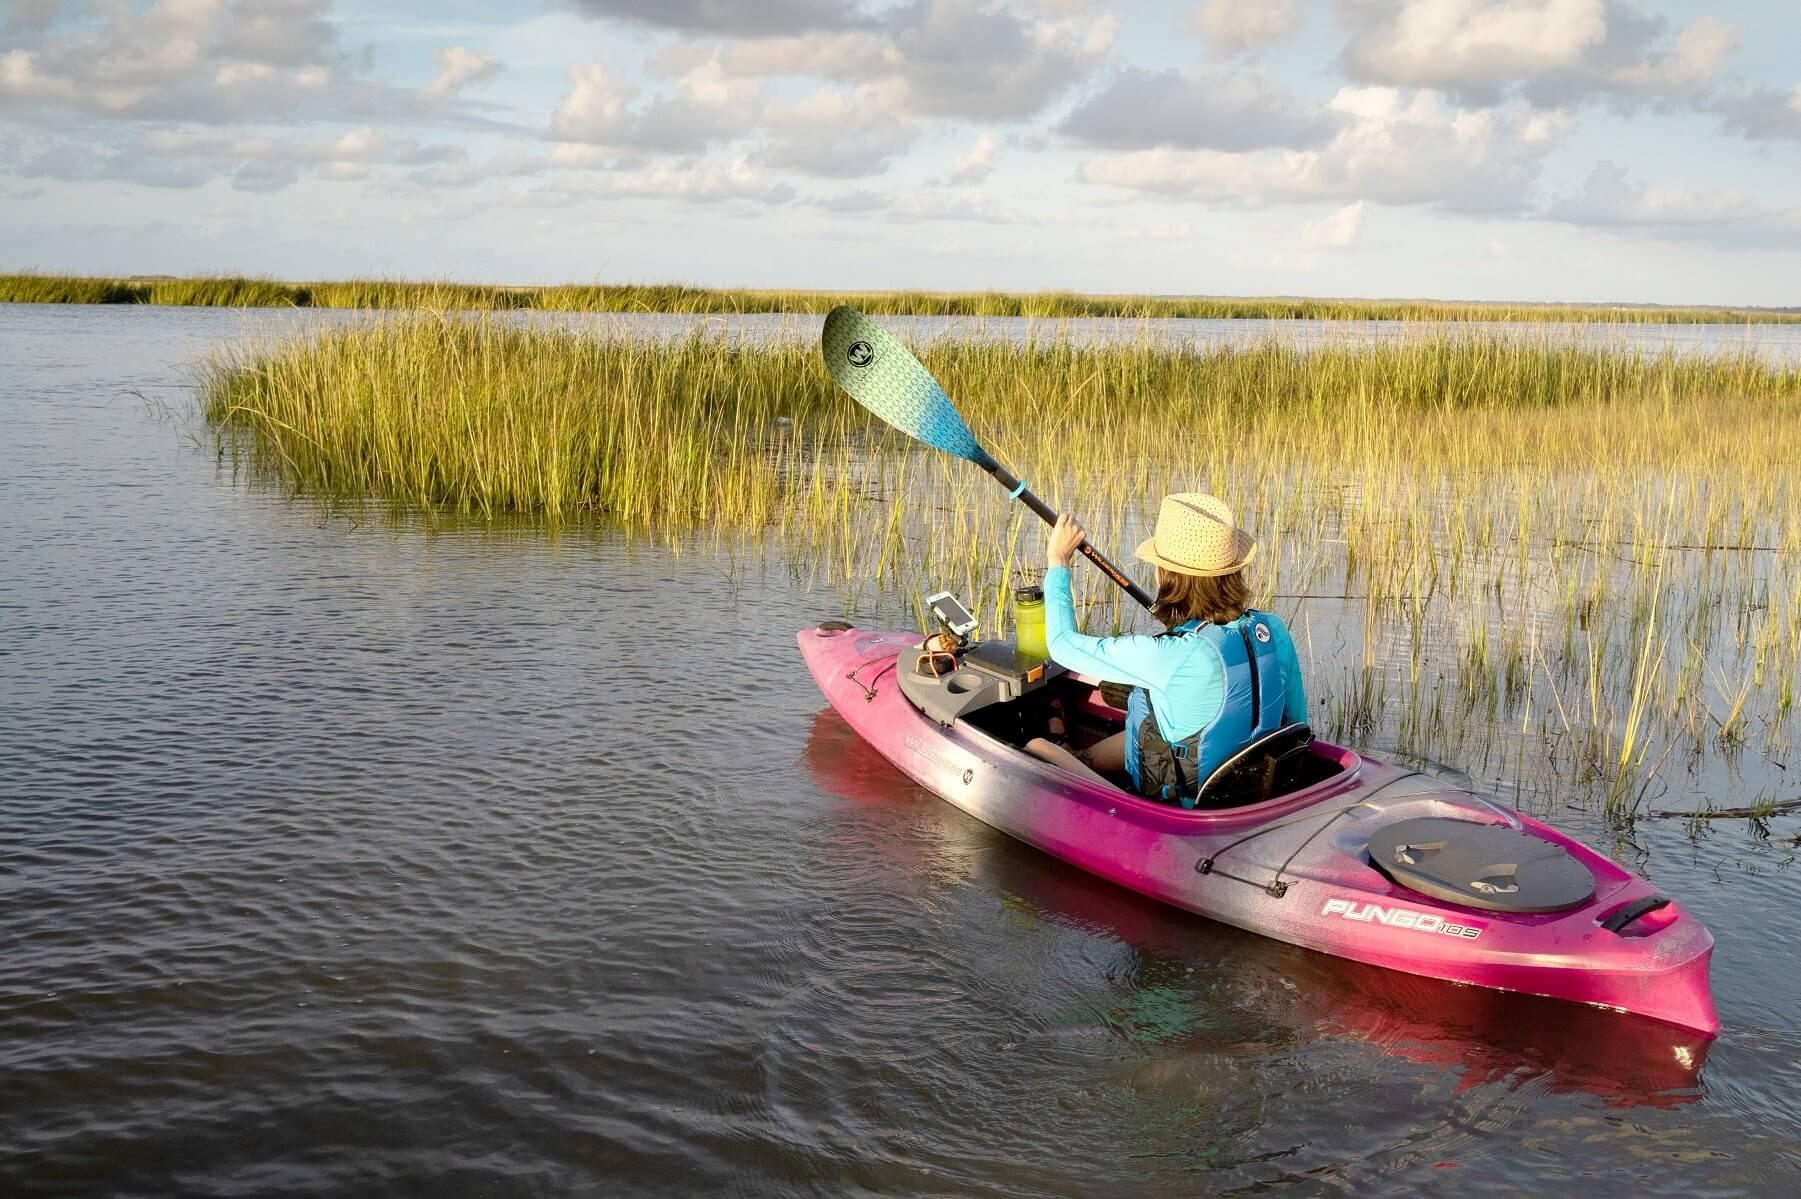 Calgary - Kayak, SUP, Canoe & Fishing Demo - May 25 and 26, 2019